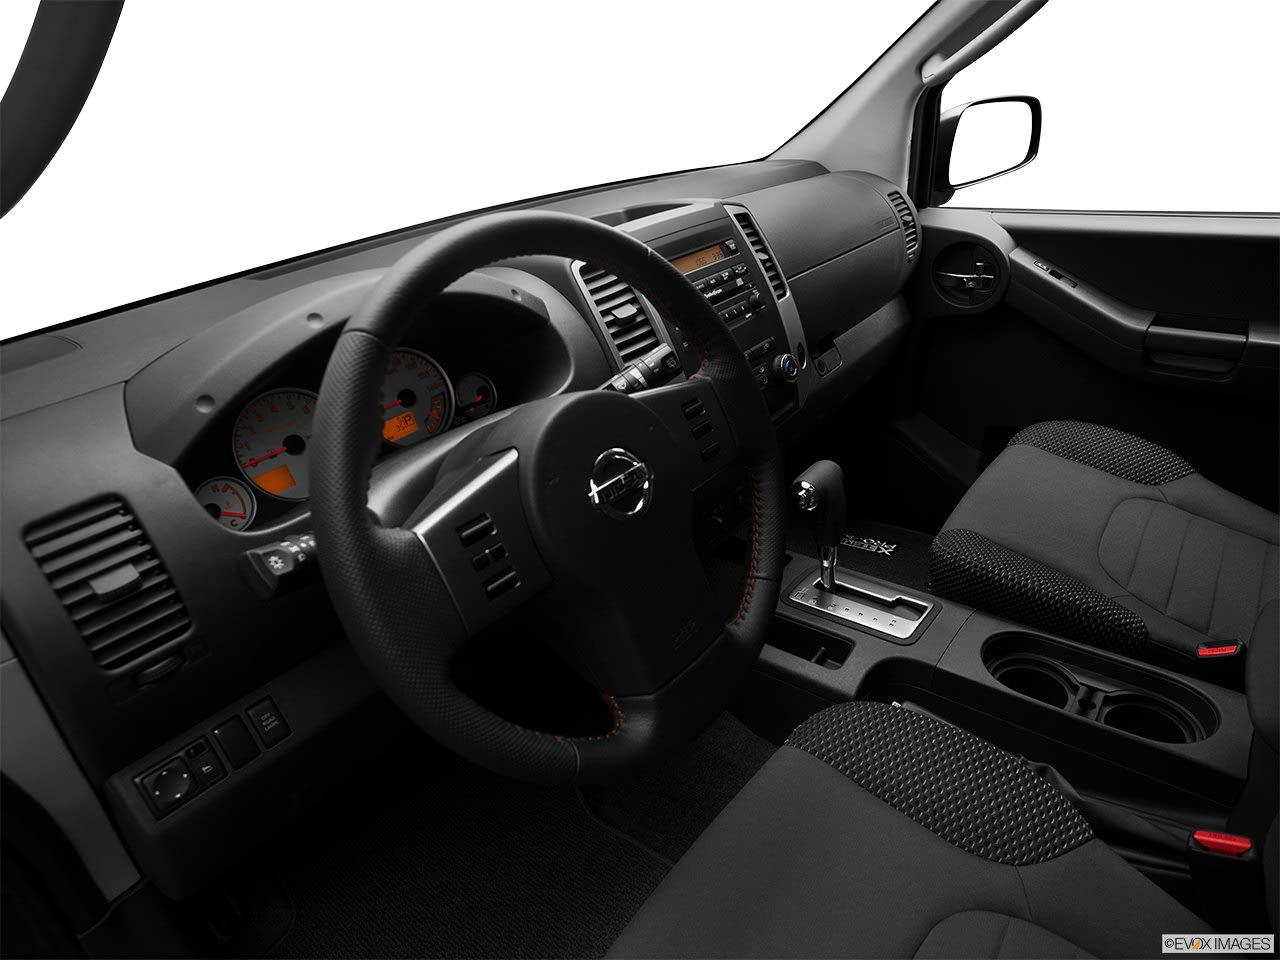 Nissan Xterra 2012 Interior